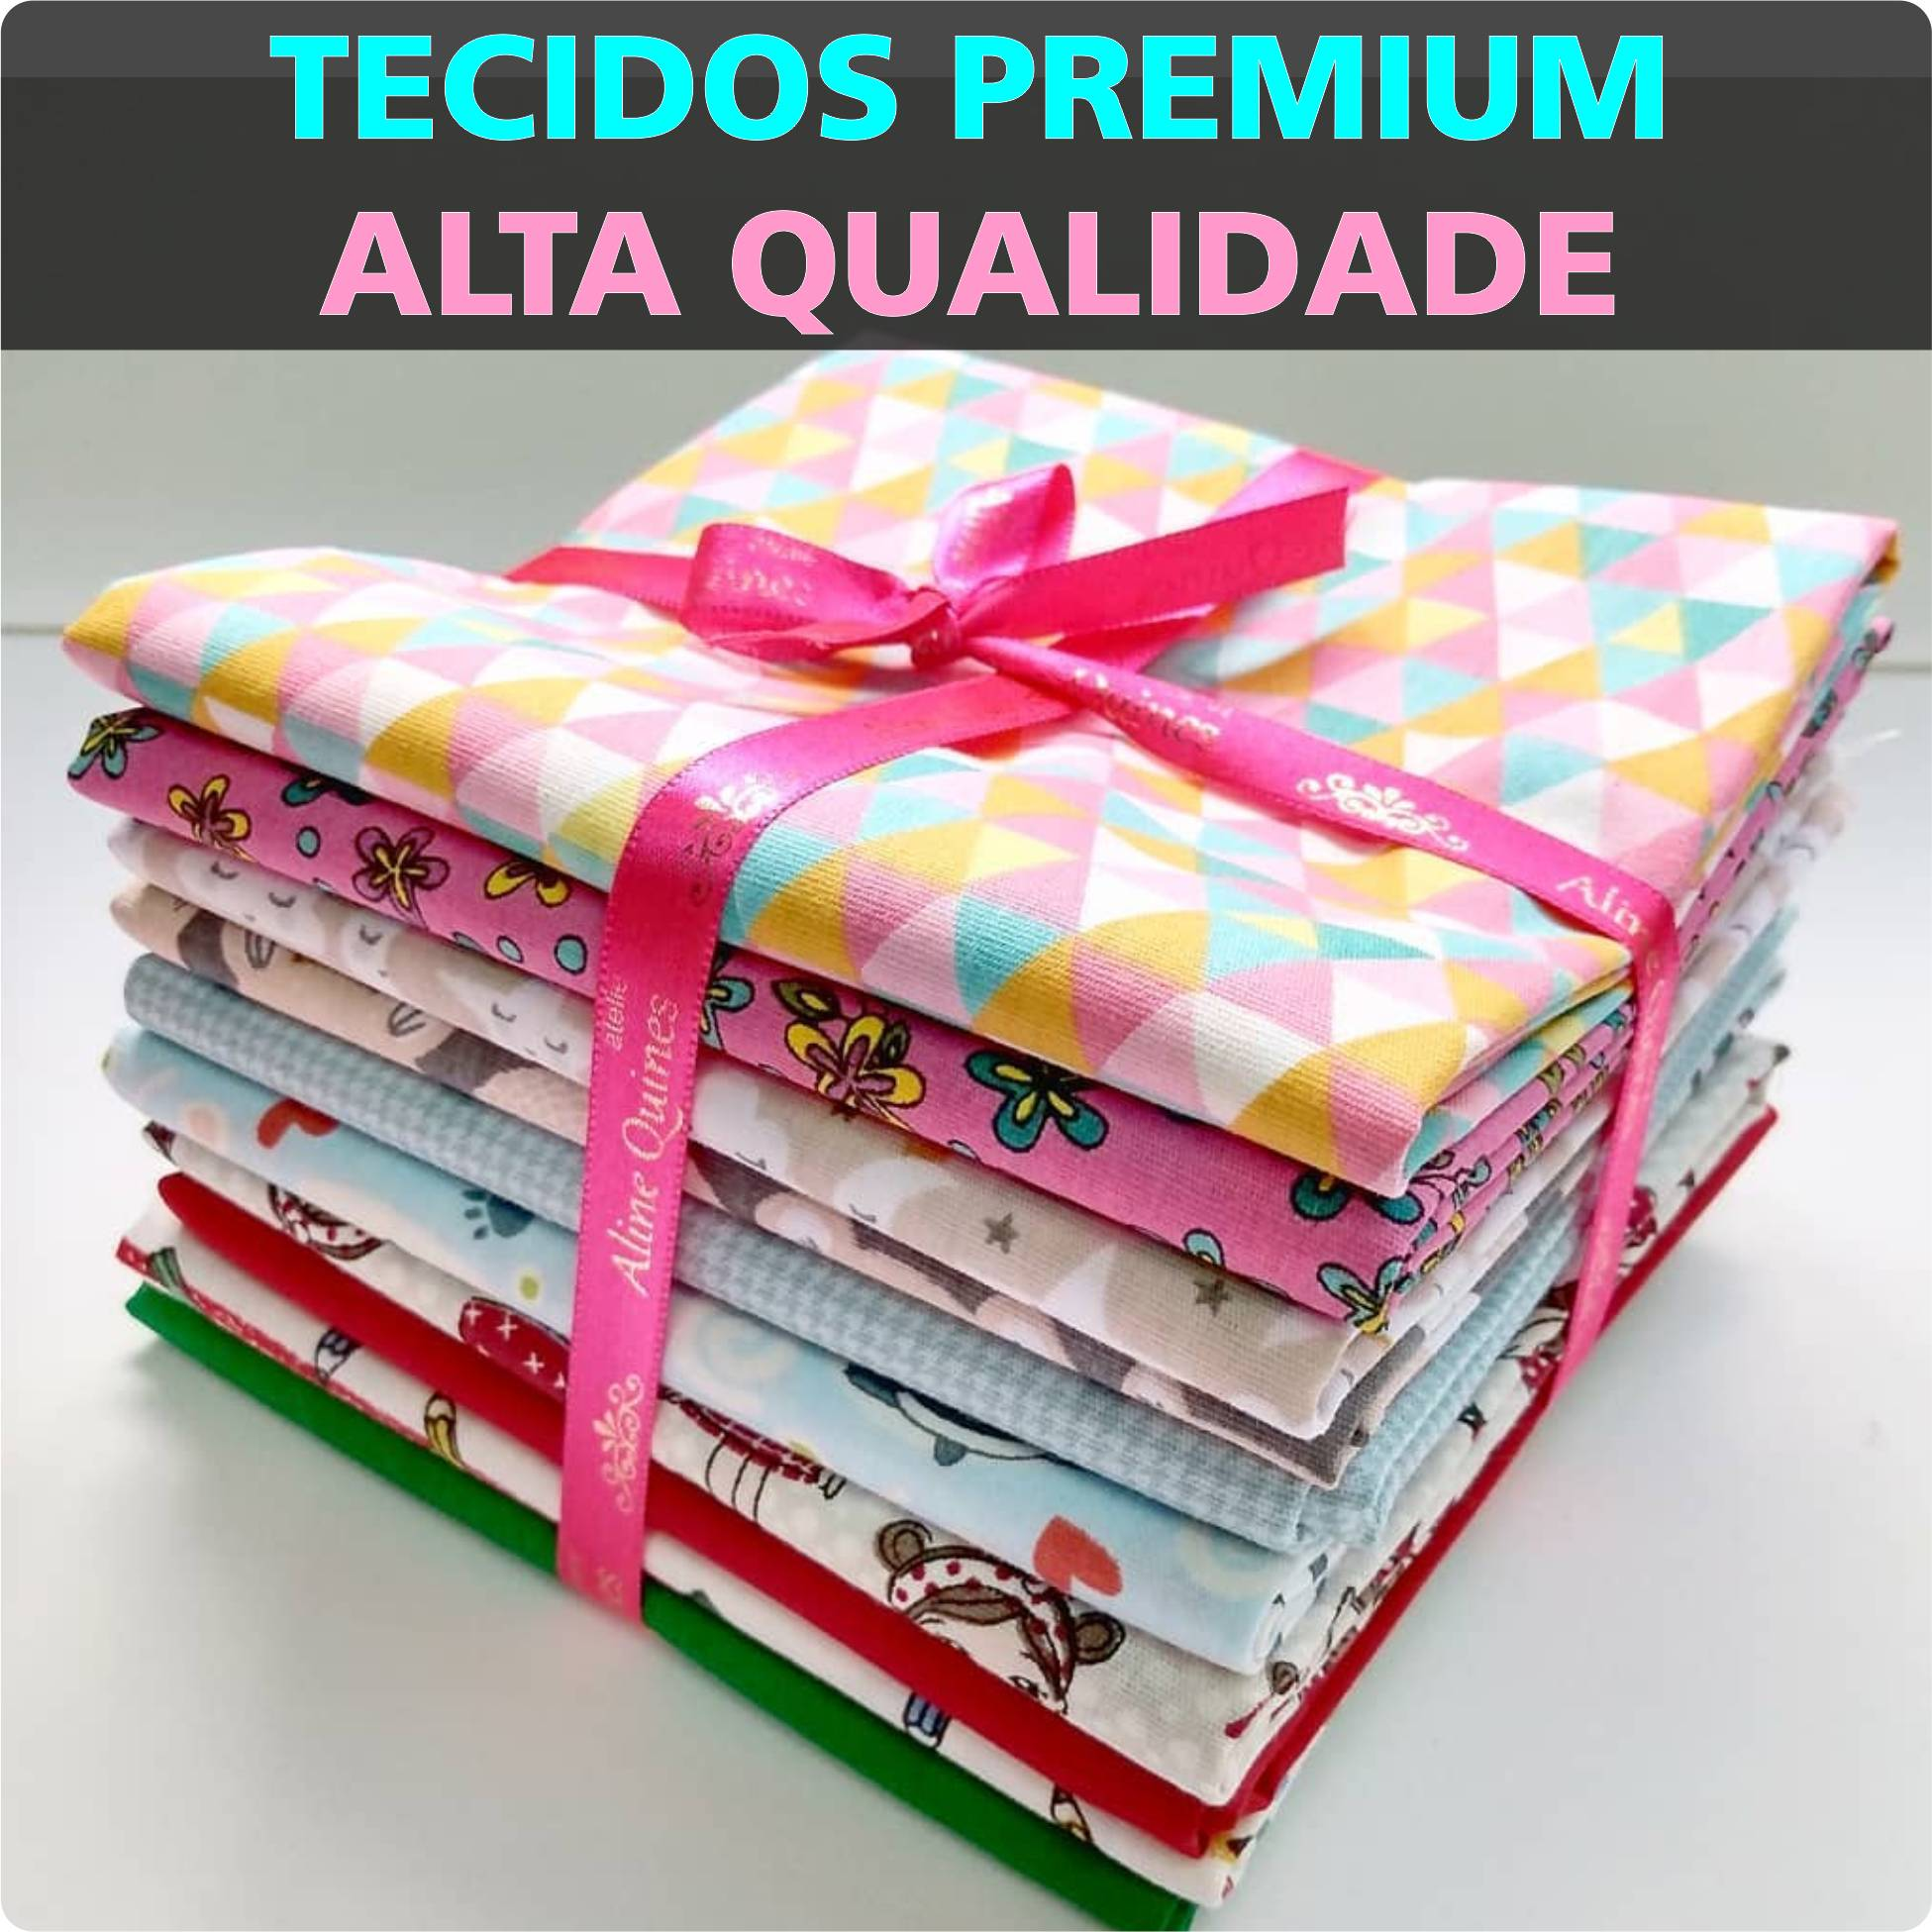 FERNANDO MALUHY - CARACOL FUNDO PRETO - 25cm X 150cm - Tecido Tricoline